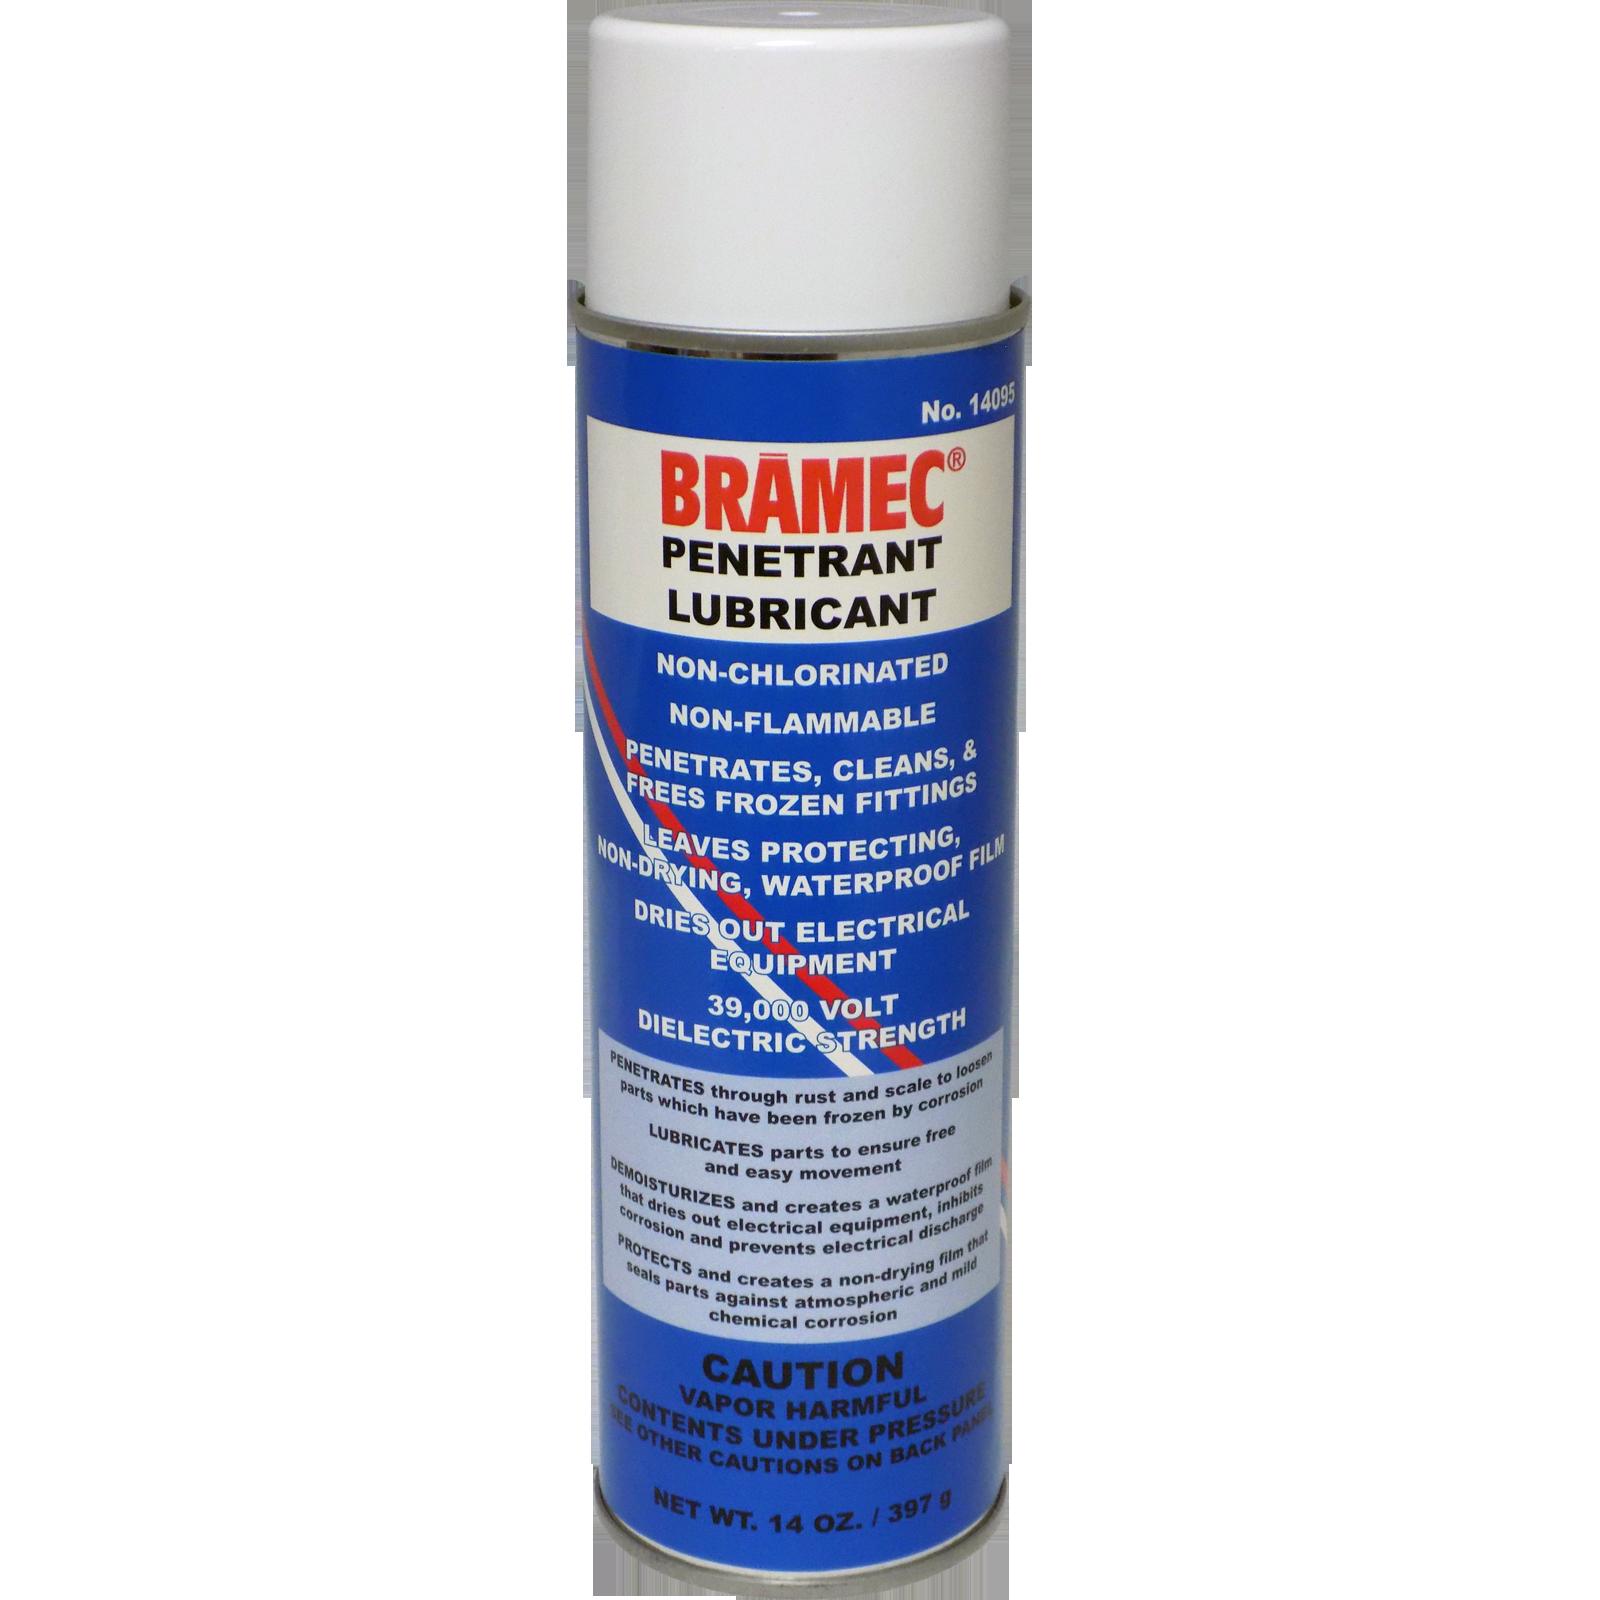 Lubricants, Sealants, & Chemicals